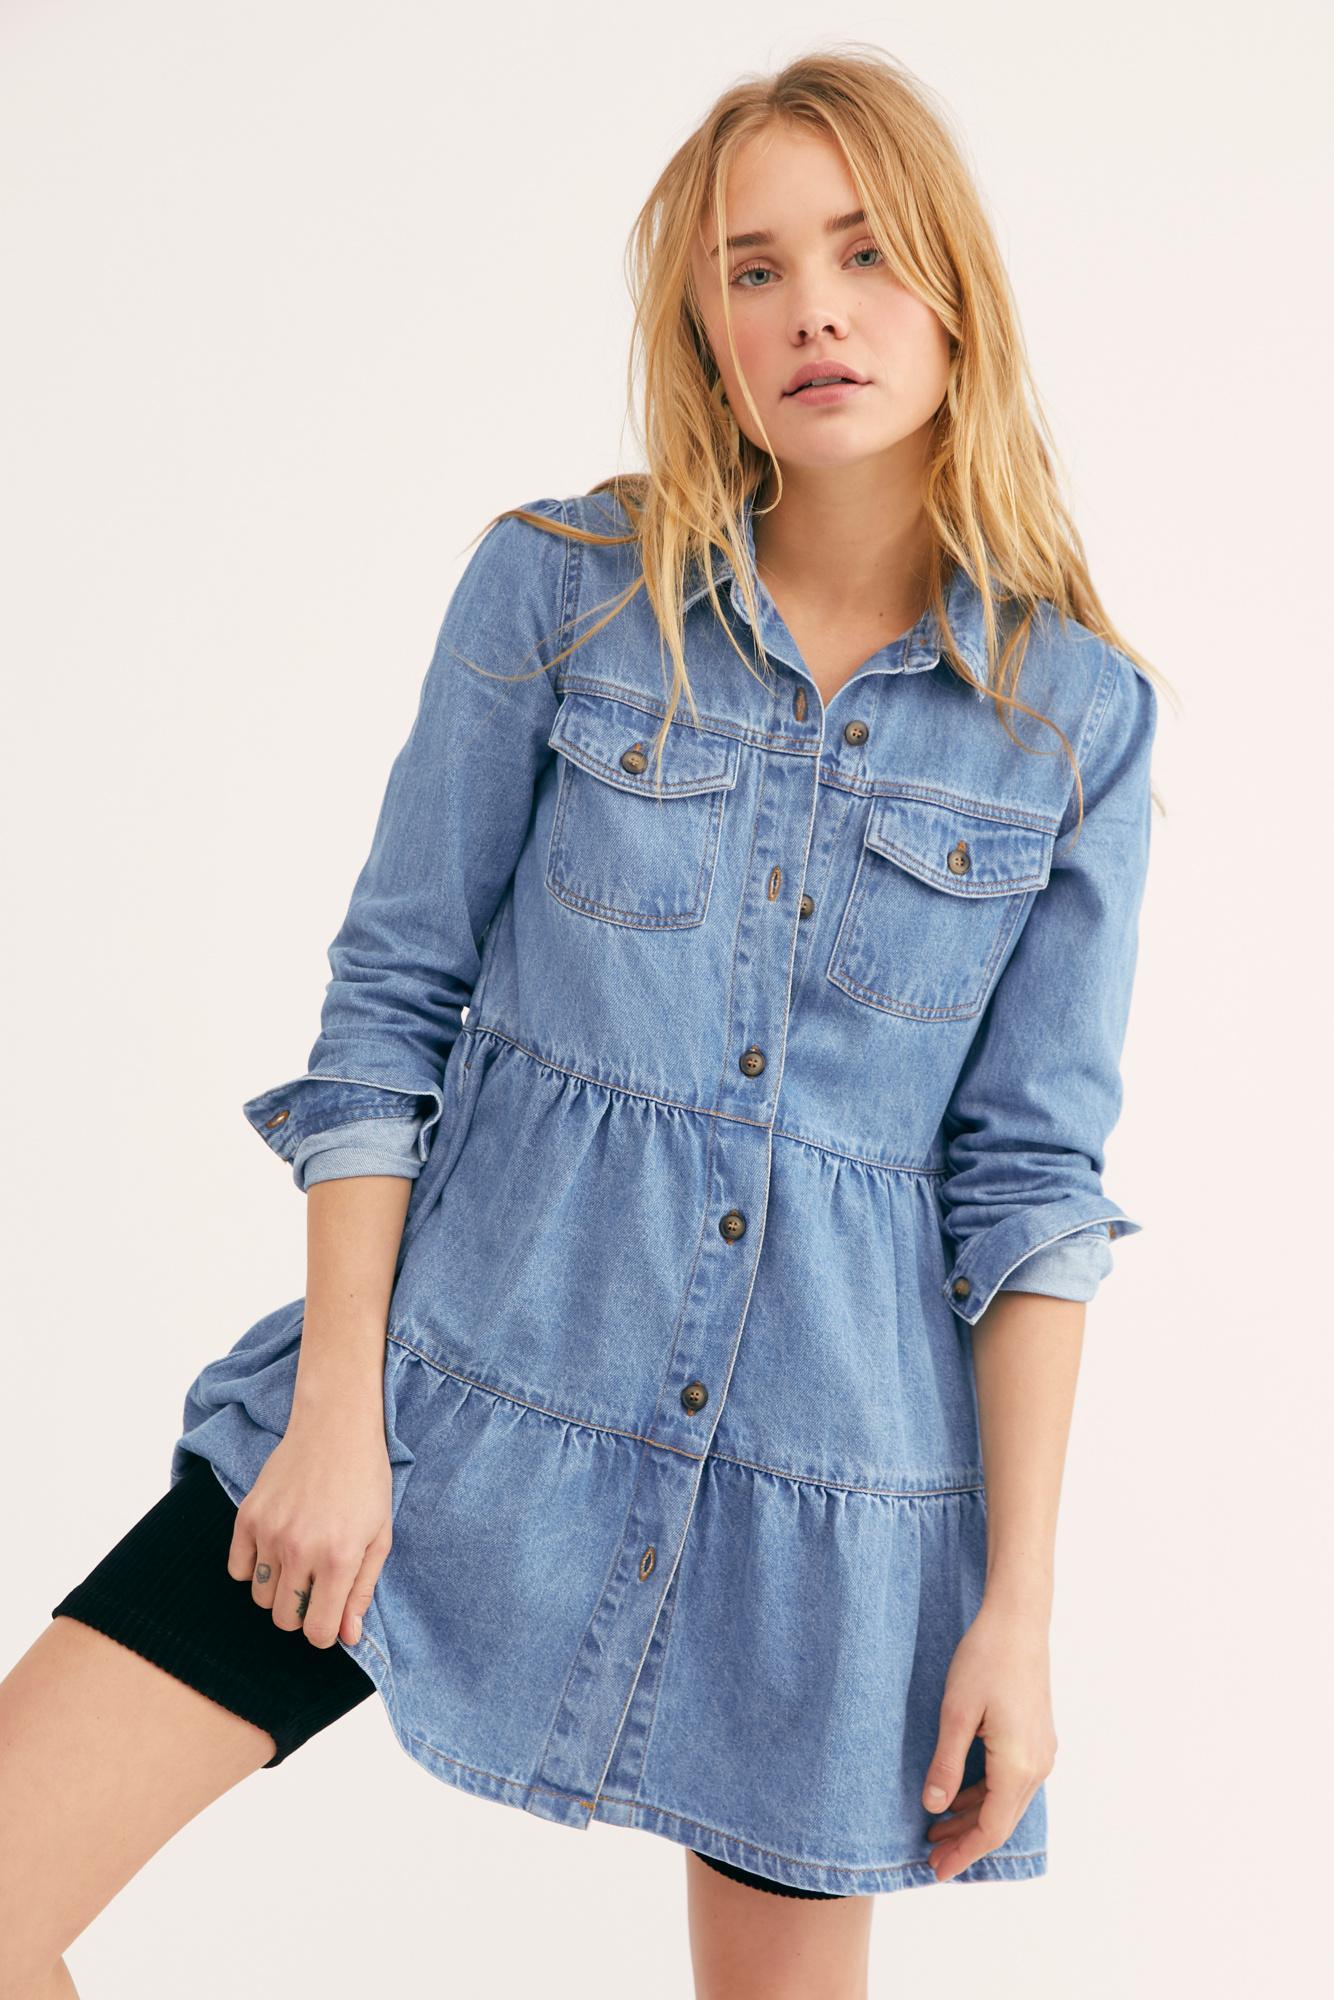 8a8a36b9204 Free People - Blue Nicole Denim Shirt Dress - Lyst. View fullscreen